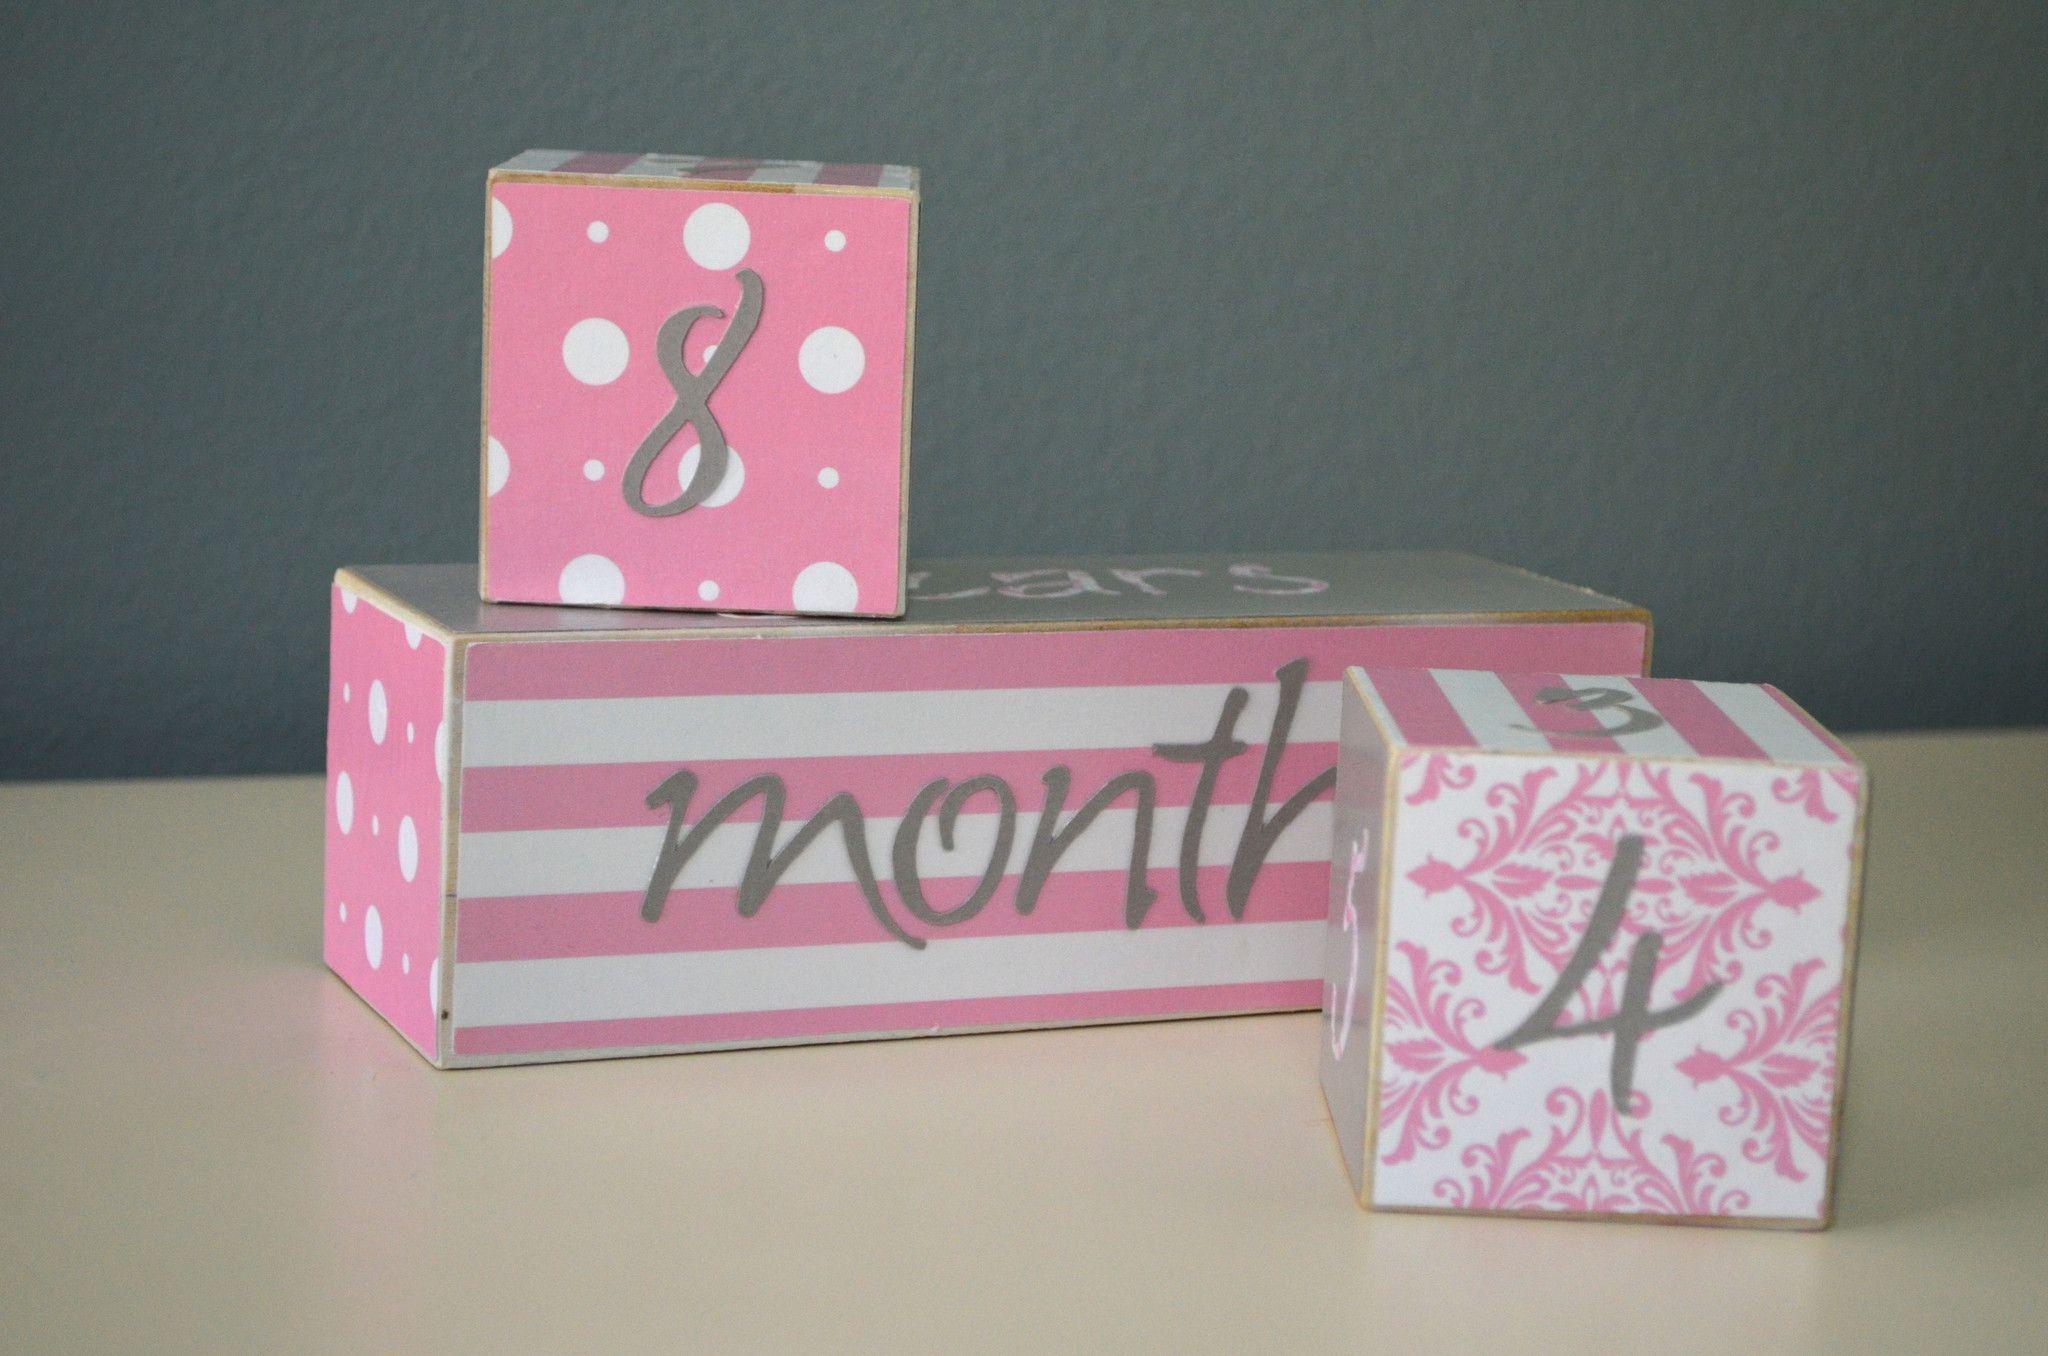 Baby Age Blocks Photo Blocks Pink And Grey Baby Blocks Photo Blocks Gifts For New Parents